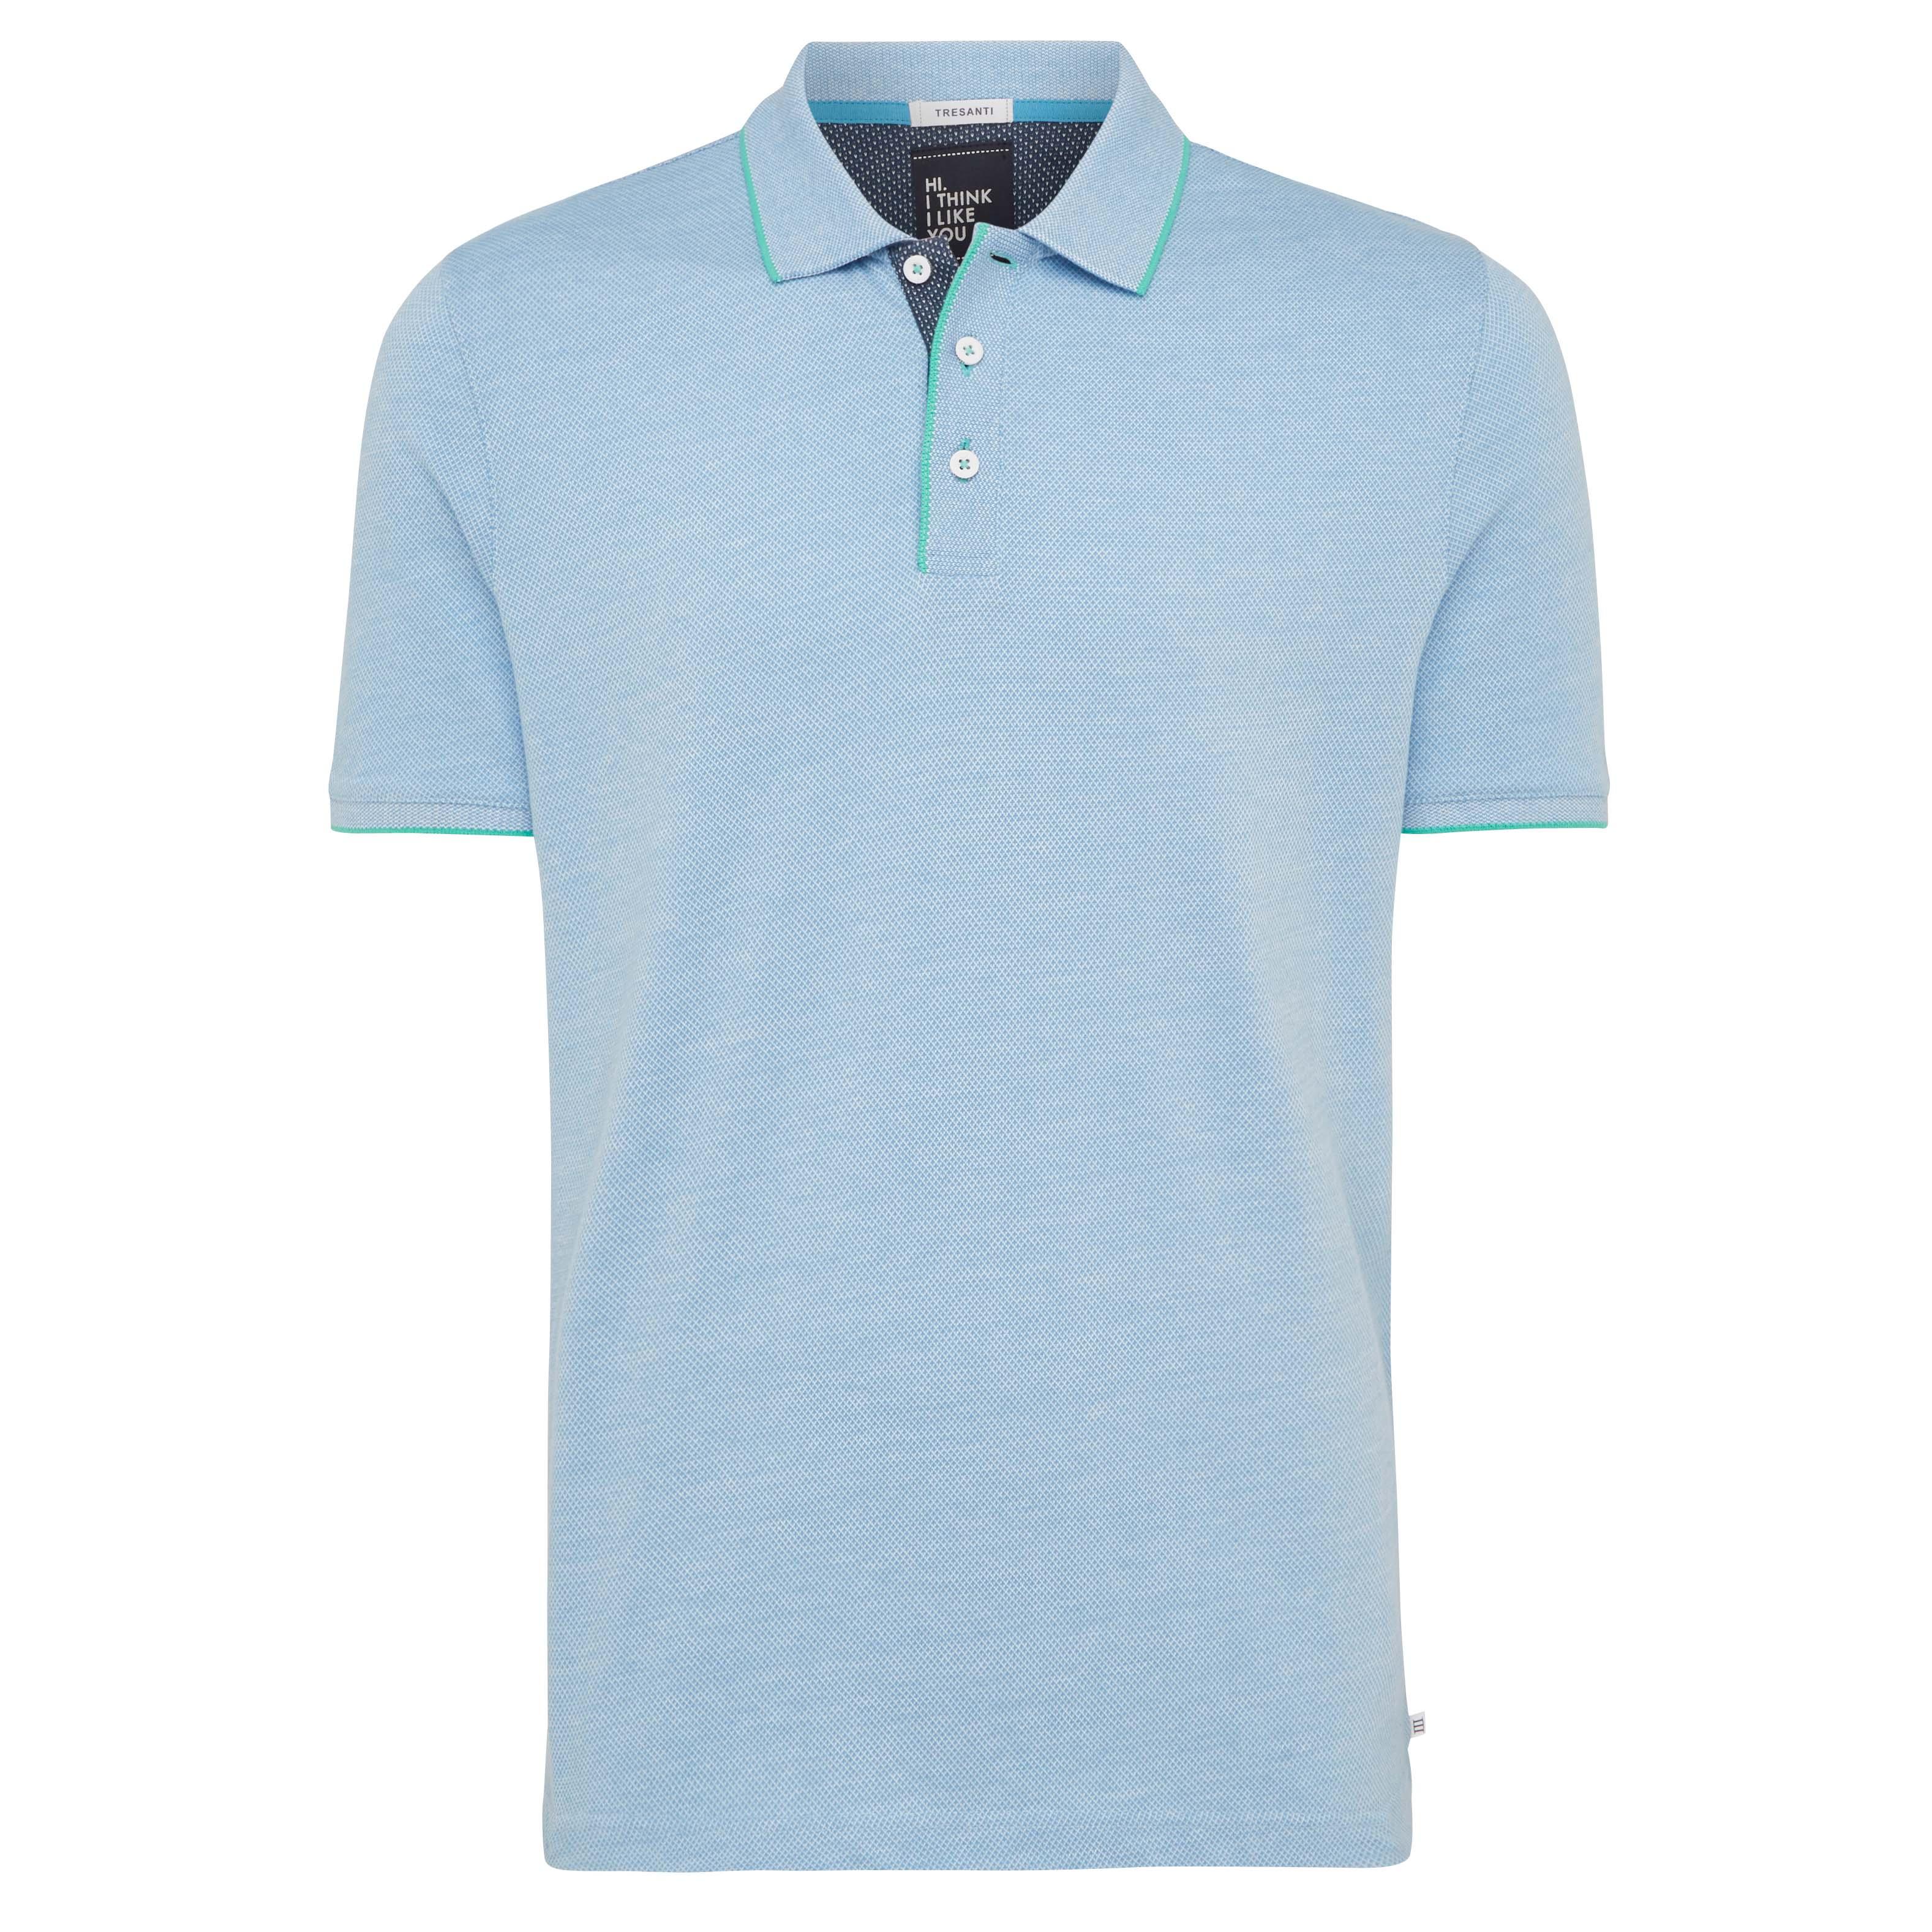 Tomas | Poloshirt light blue